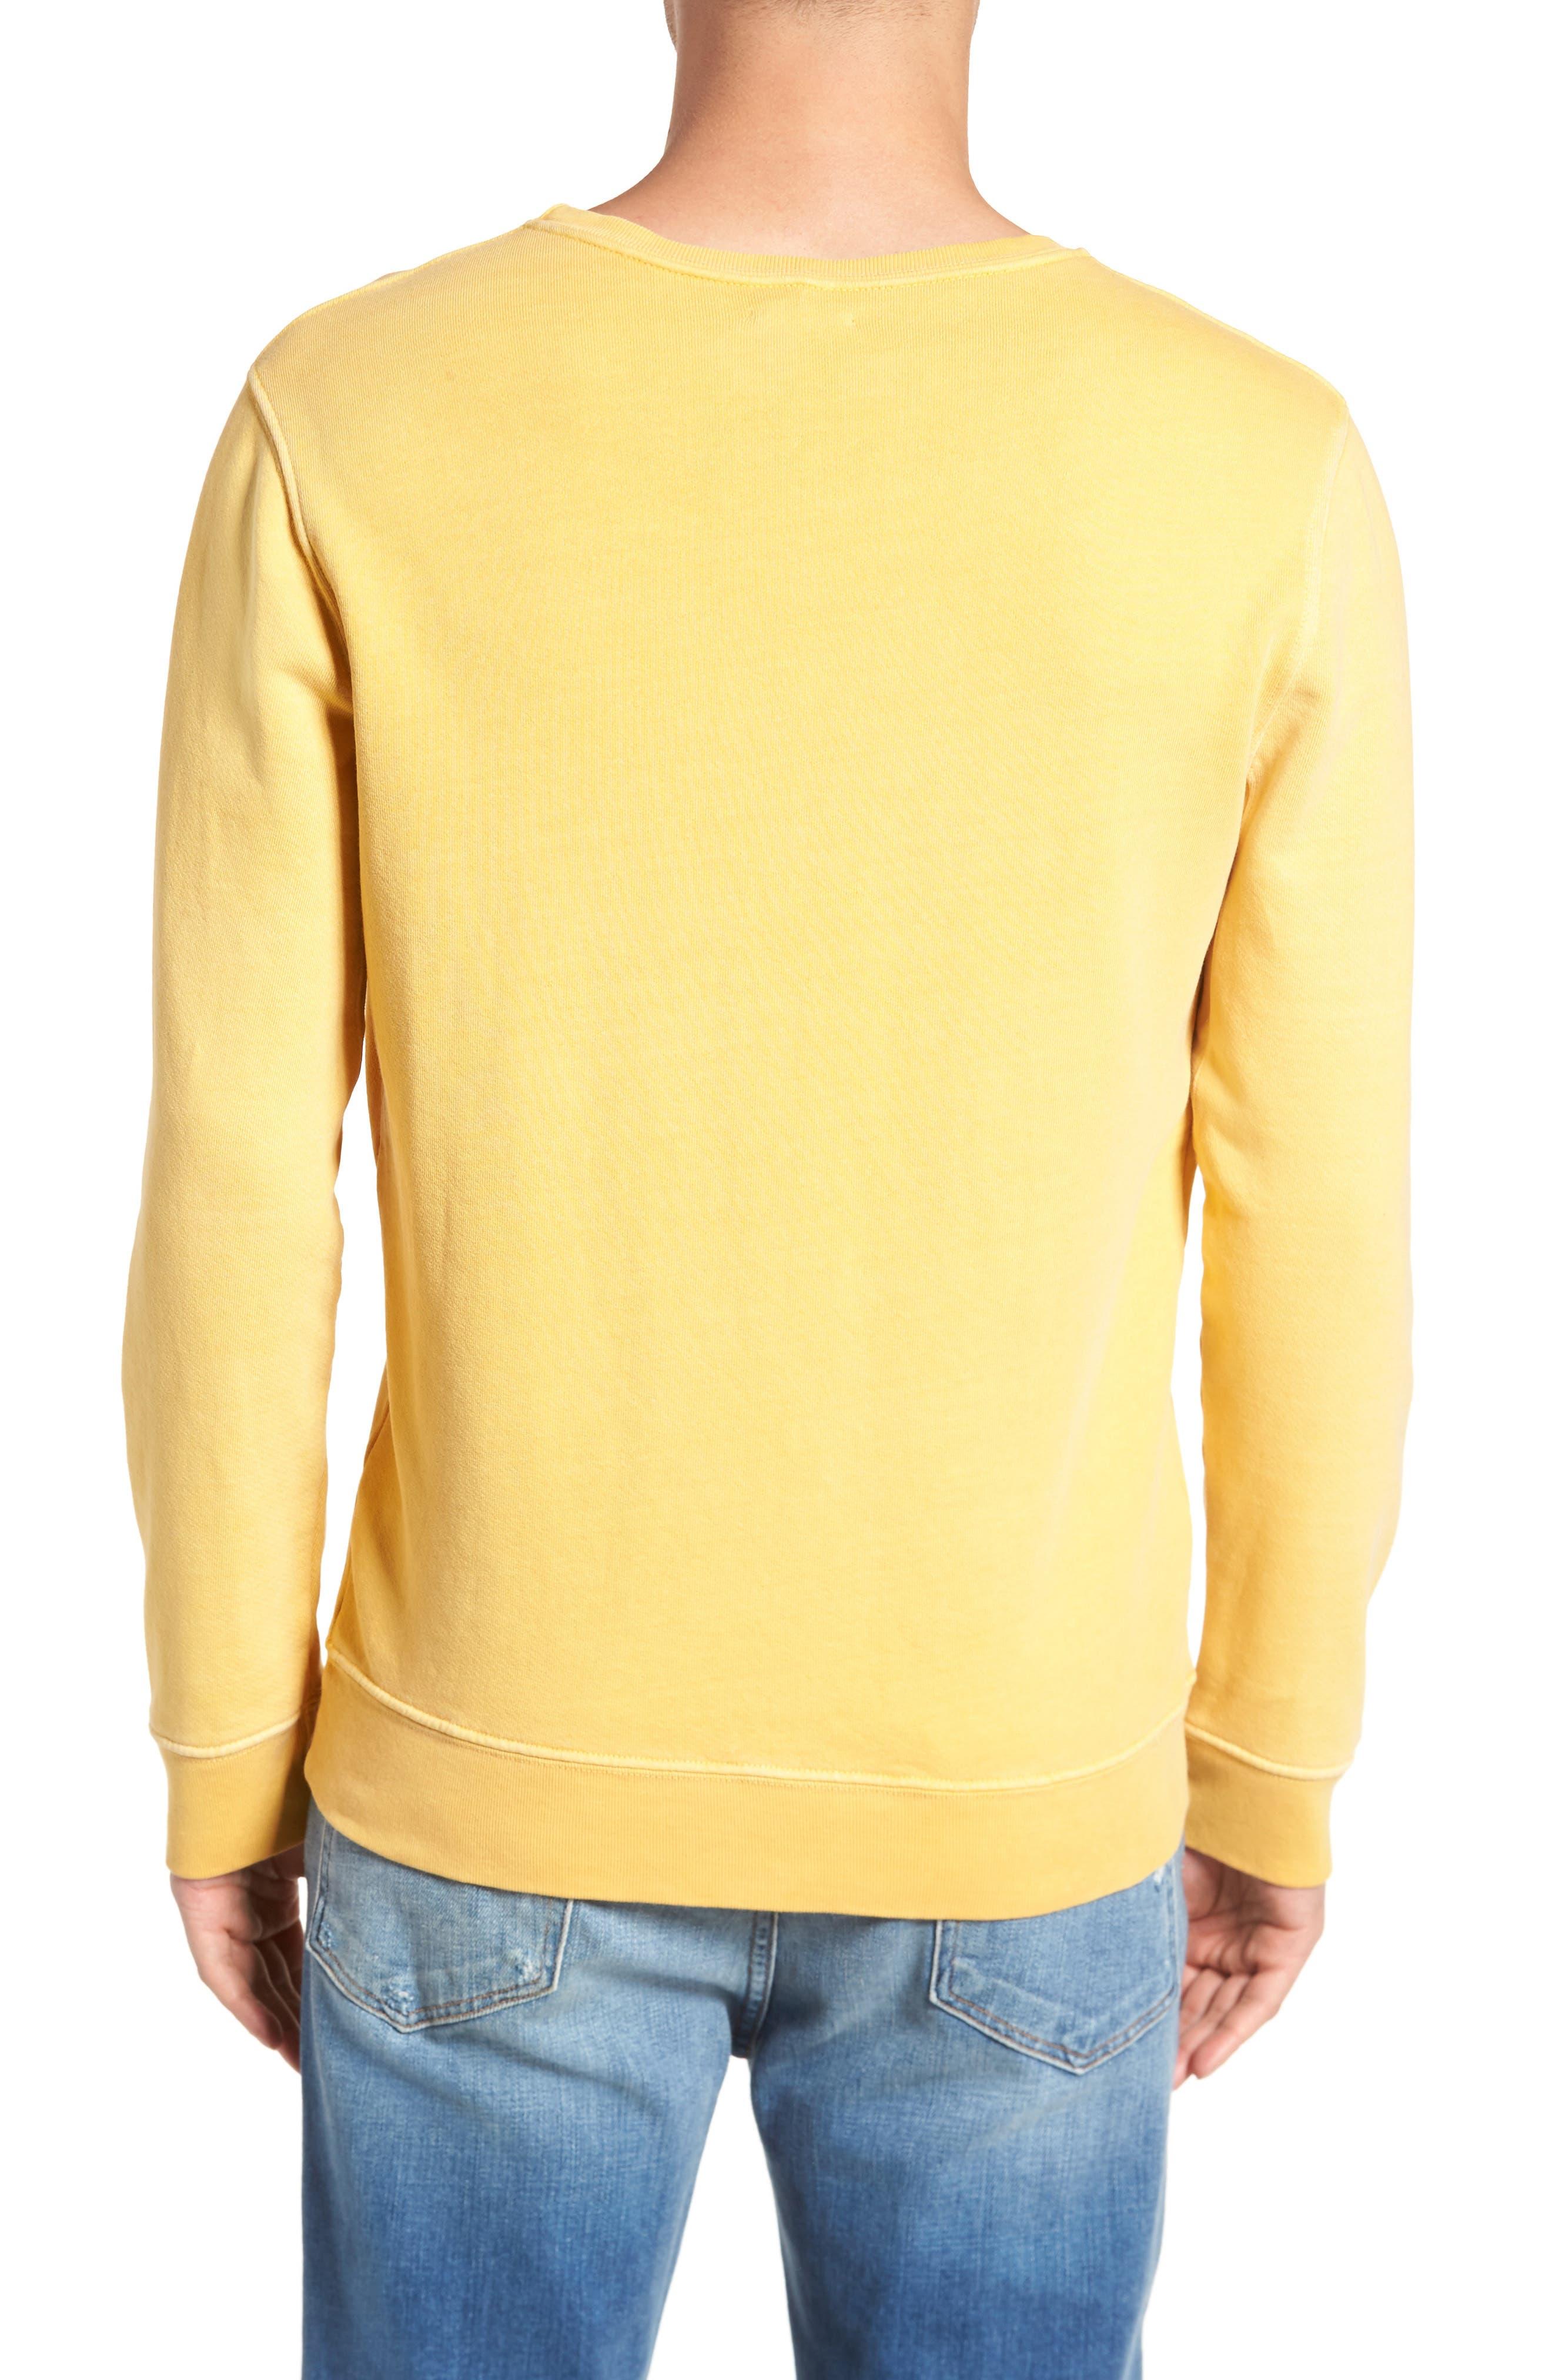 Vintage Crewneck Sweatshirt,                             Alternate thumbnail 6, color,